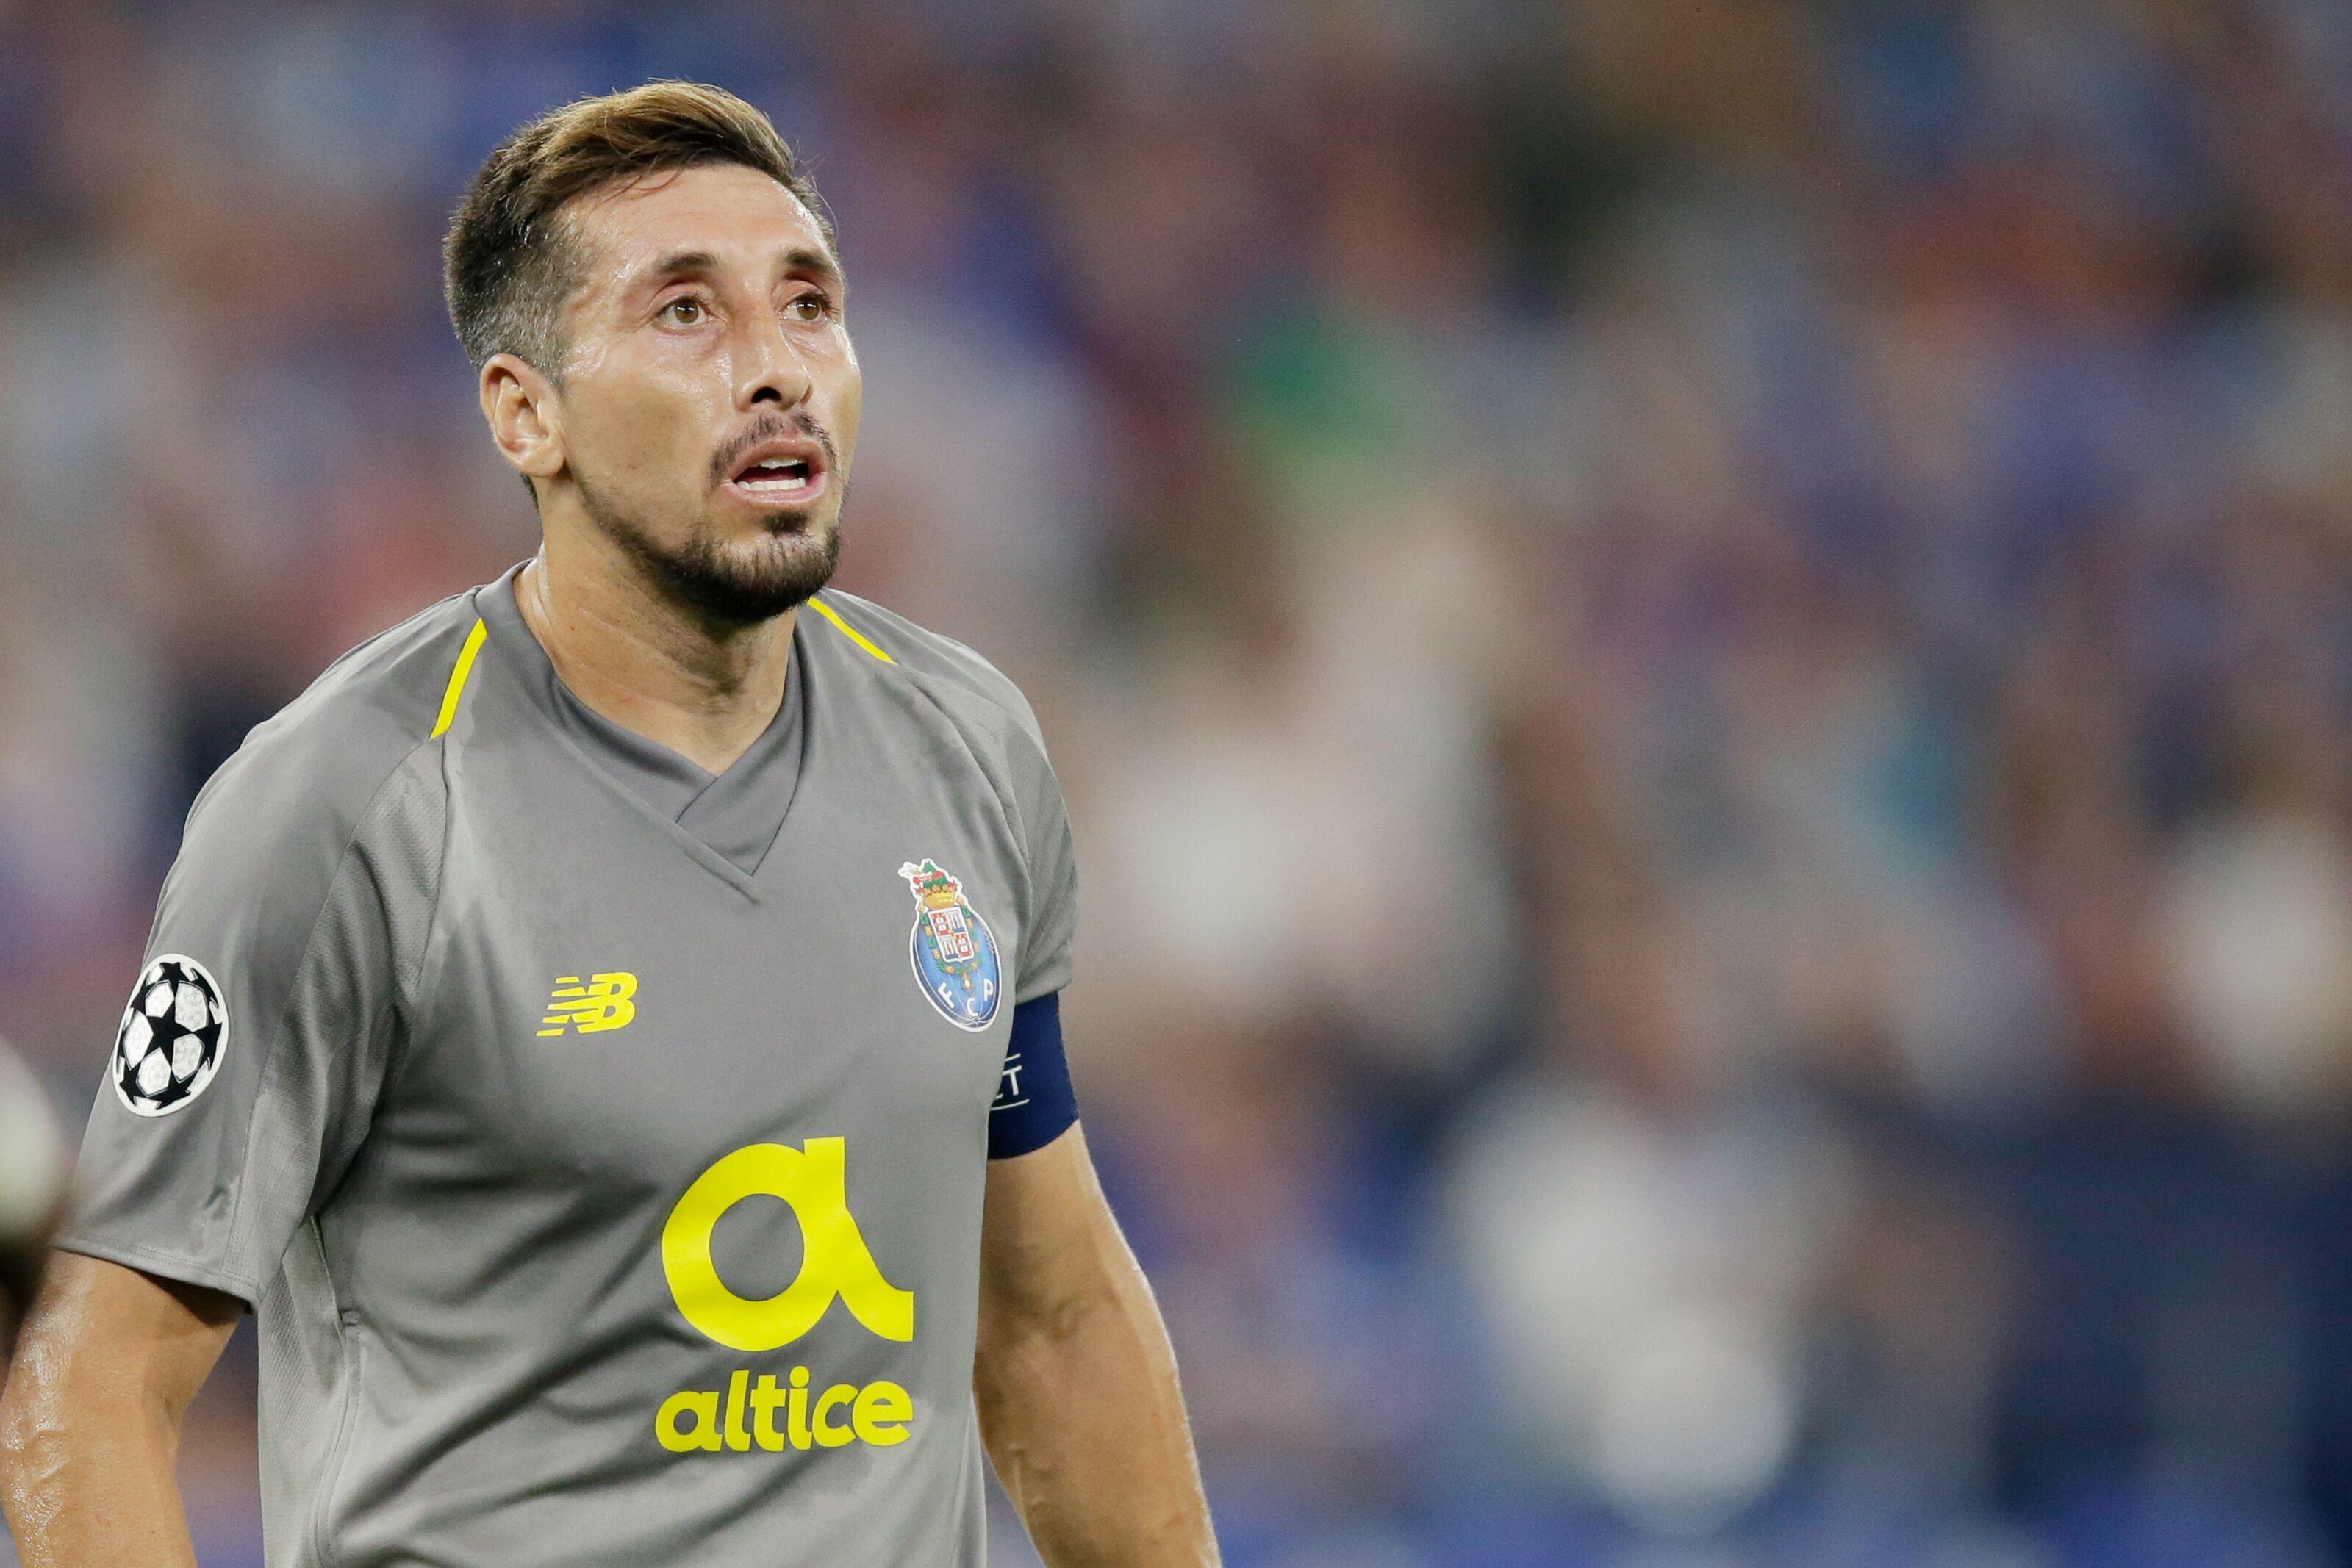 Transfer Rumors: Tottenham eye Porto midfielder Hector Herrera